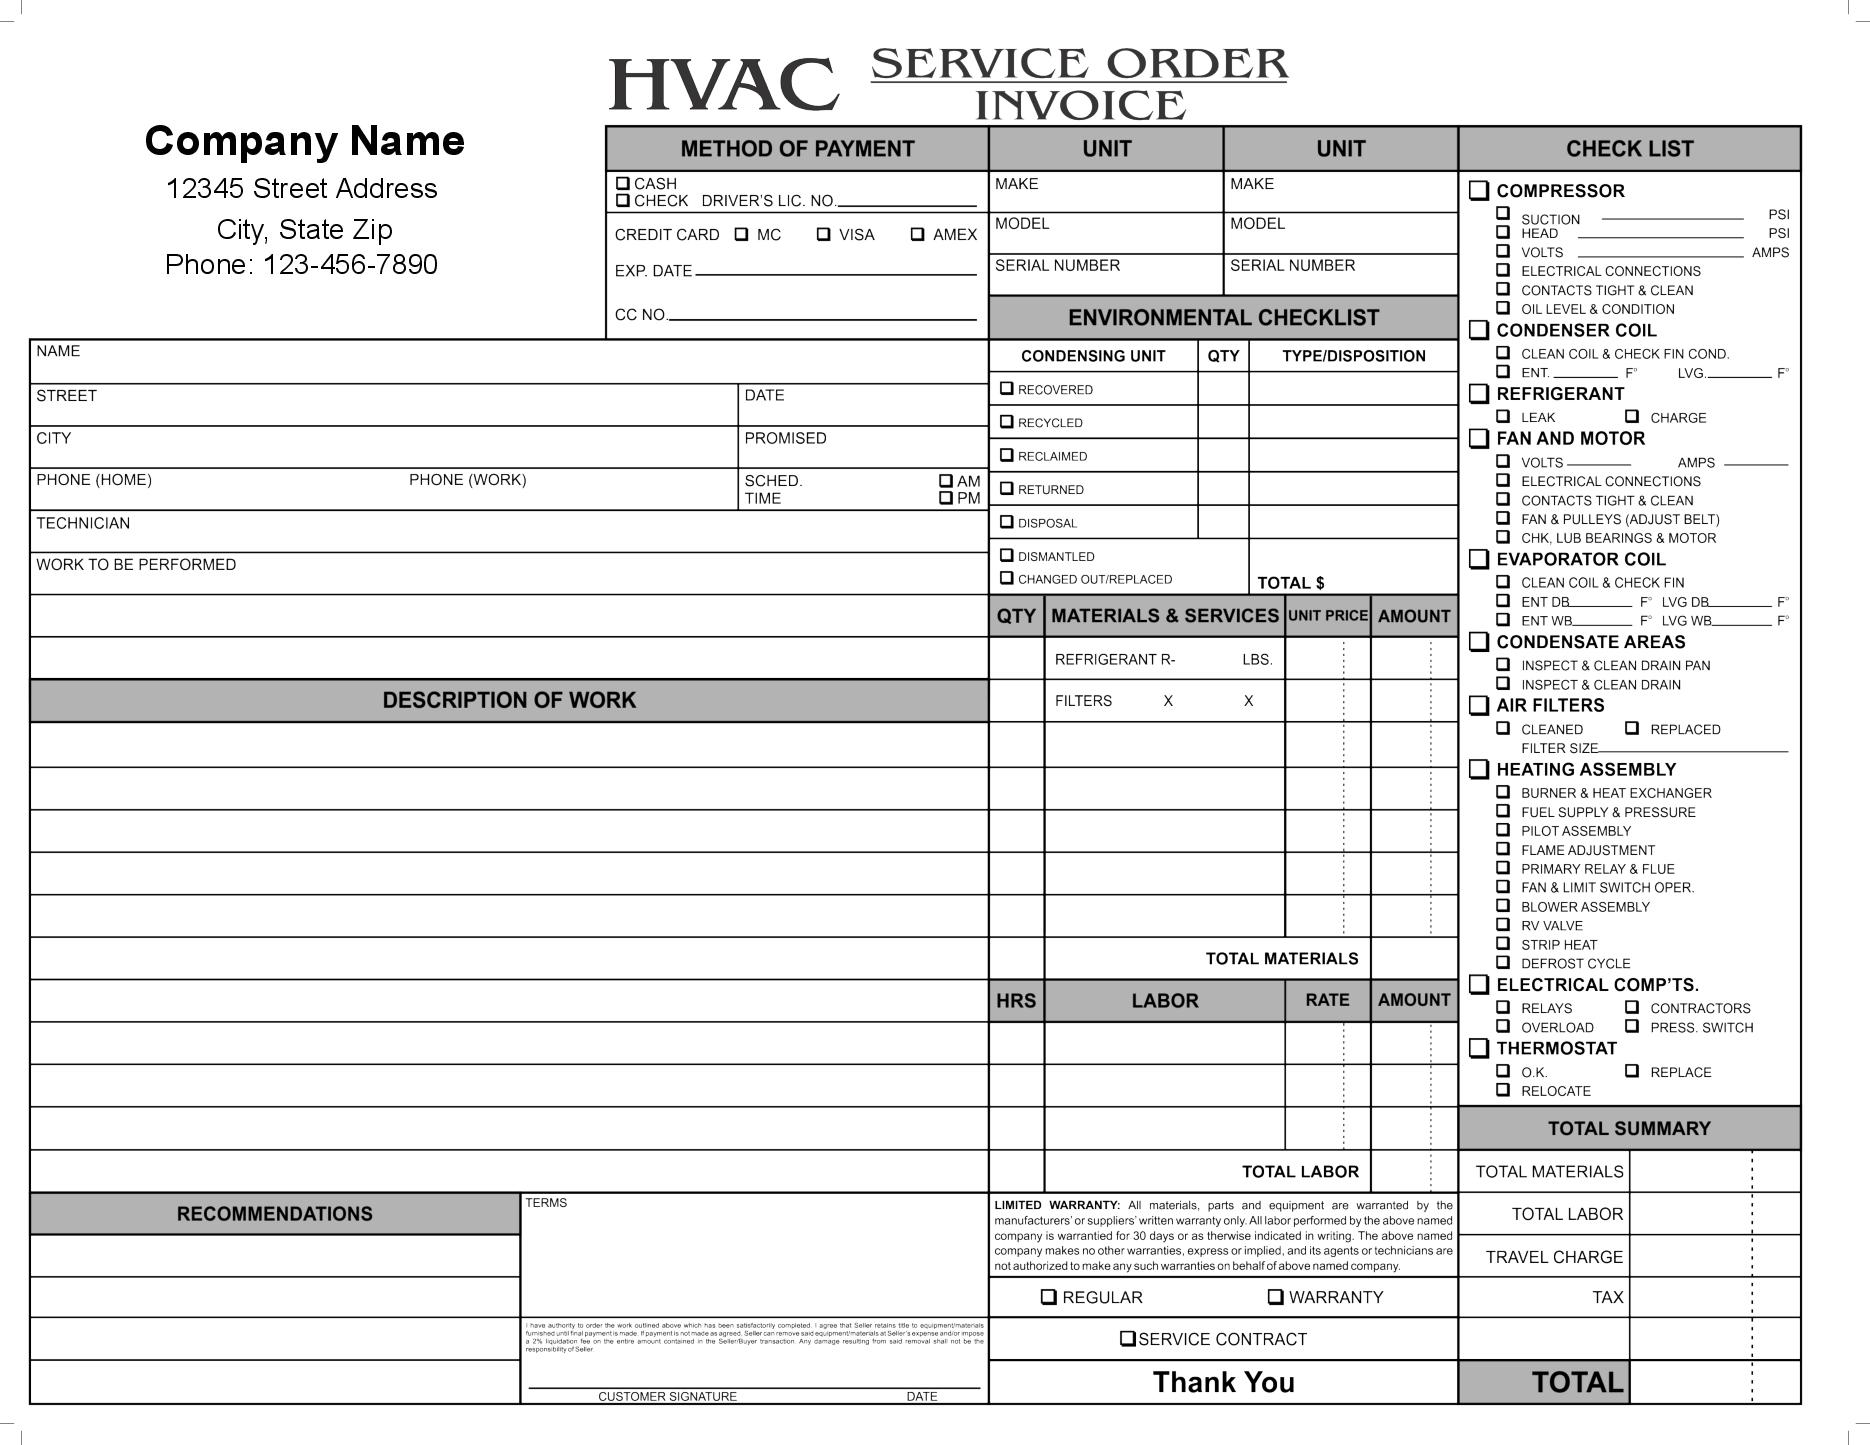 Hvac Service Order Invoice Invoice Template Ideas